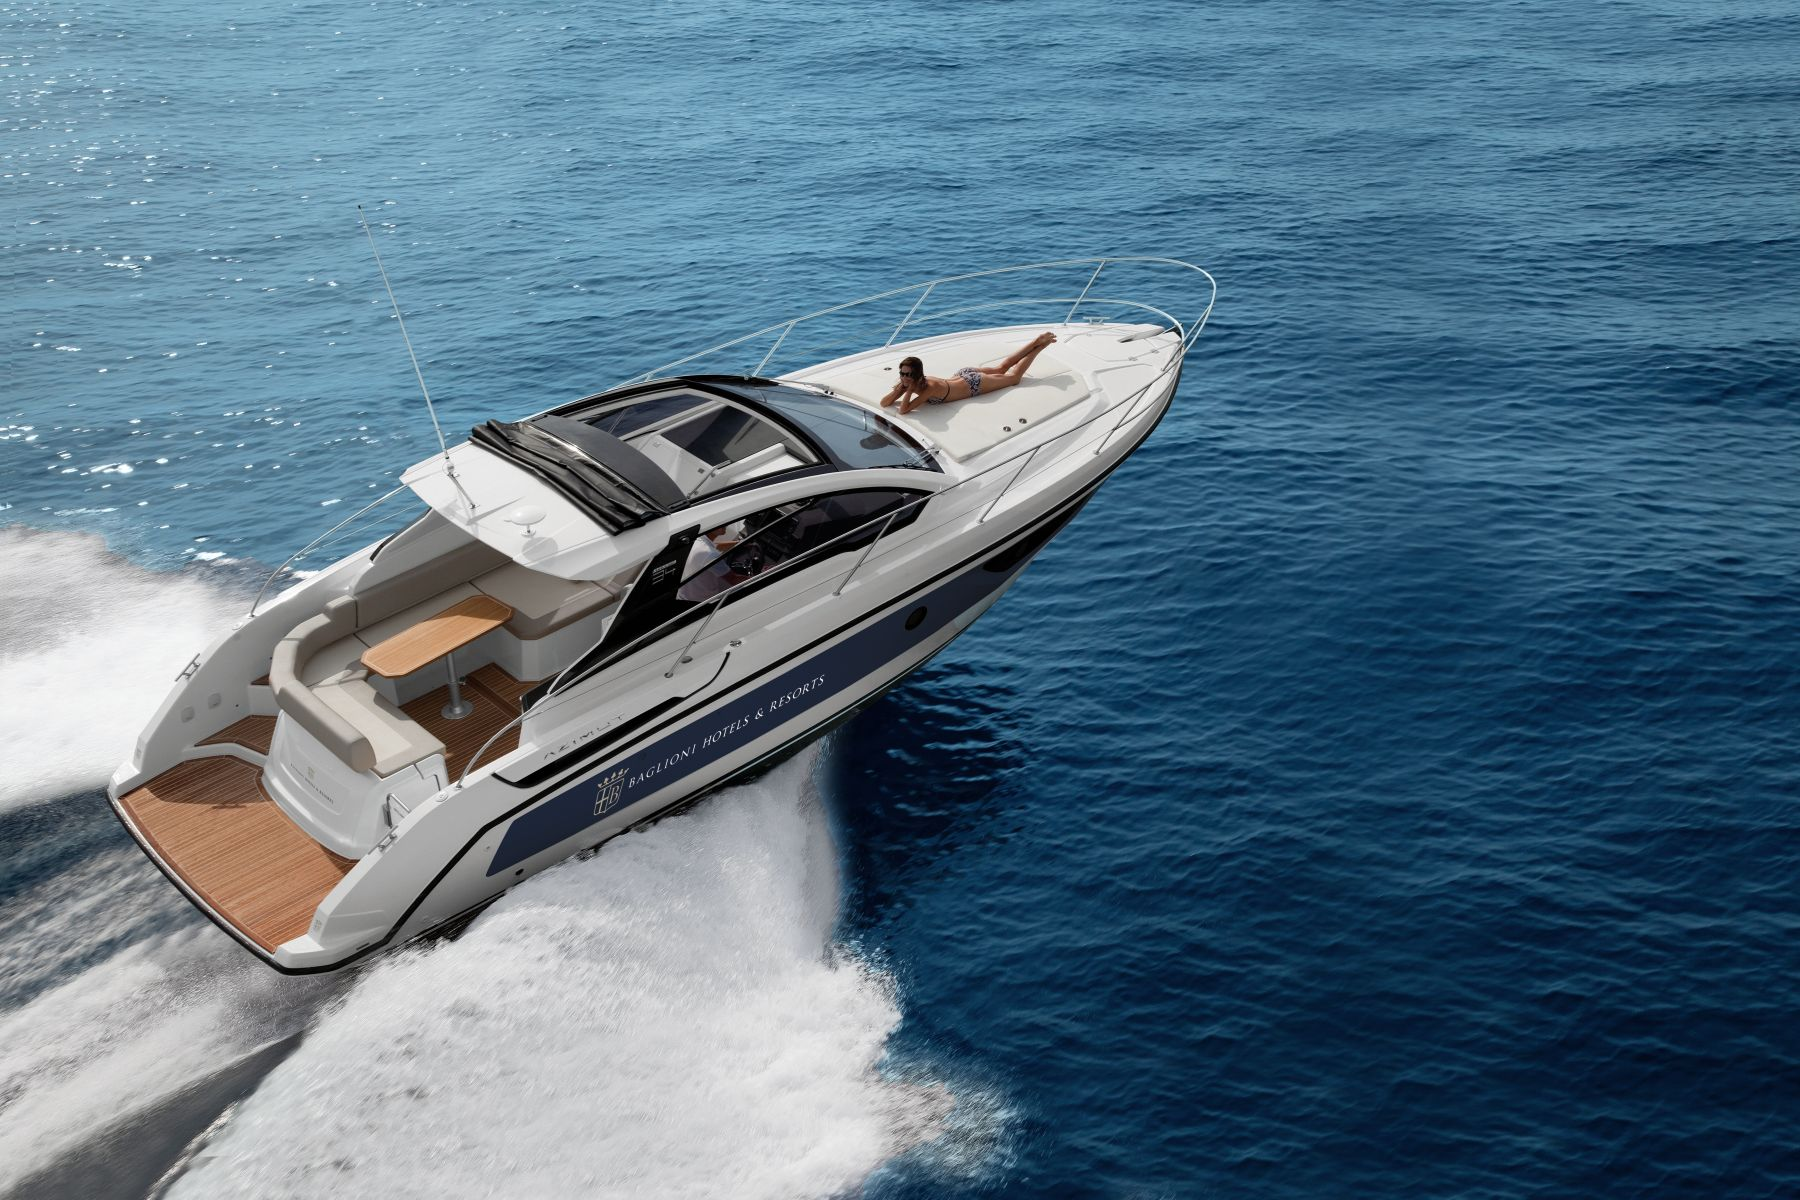 Baglioni Resort Sardinia и V MARINE организуют морские прогулки по Сардинии на элегантных яхтах Azimut Yachts.